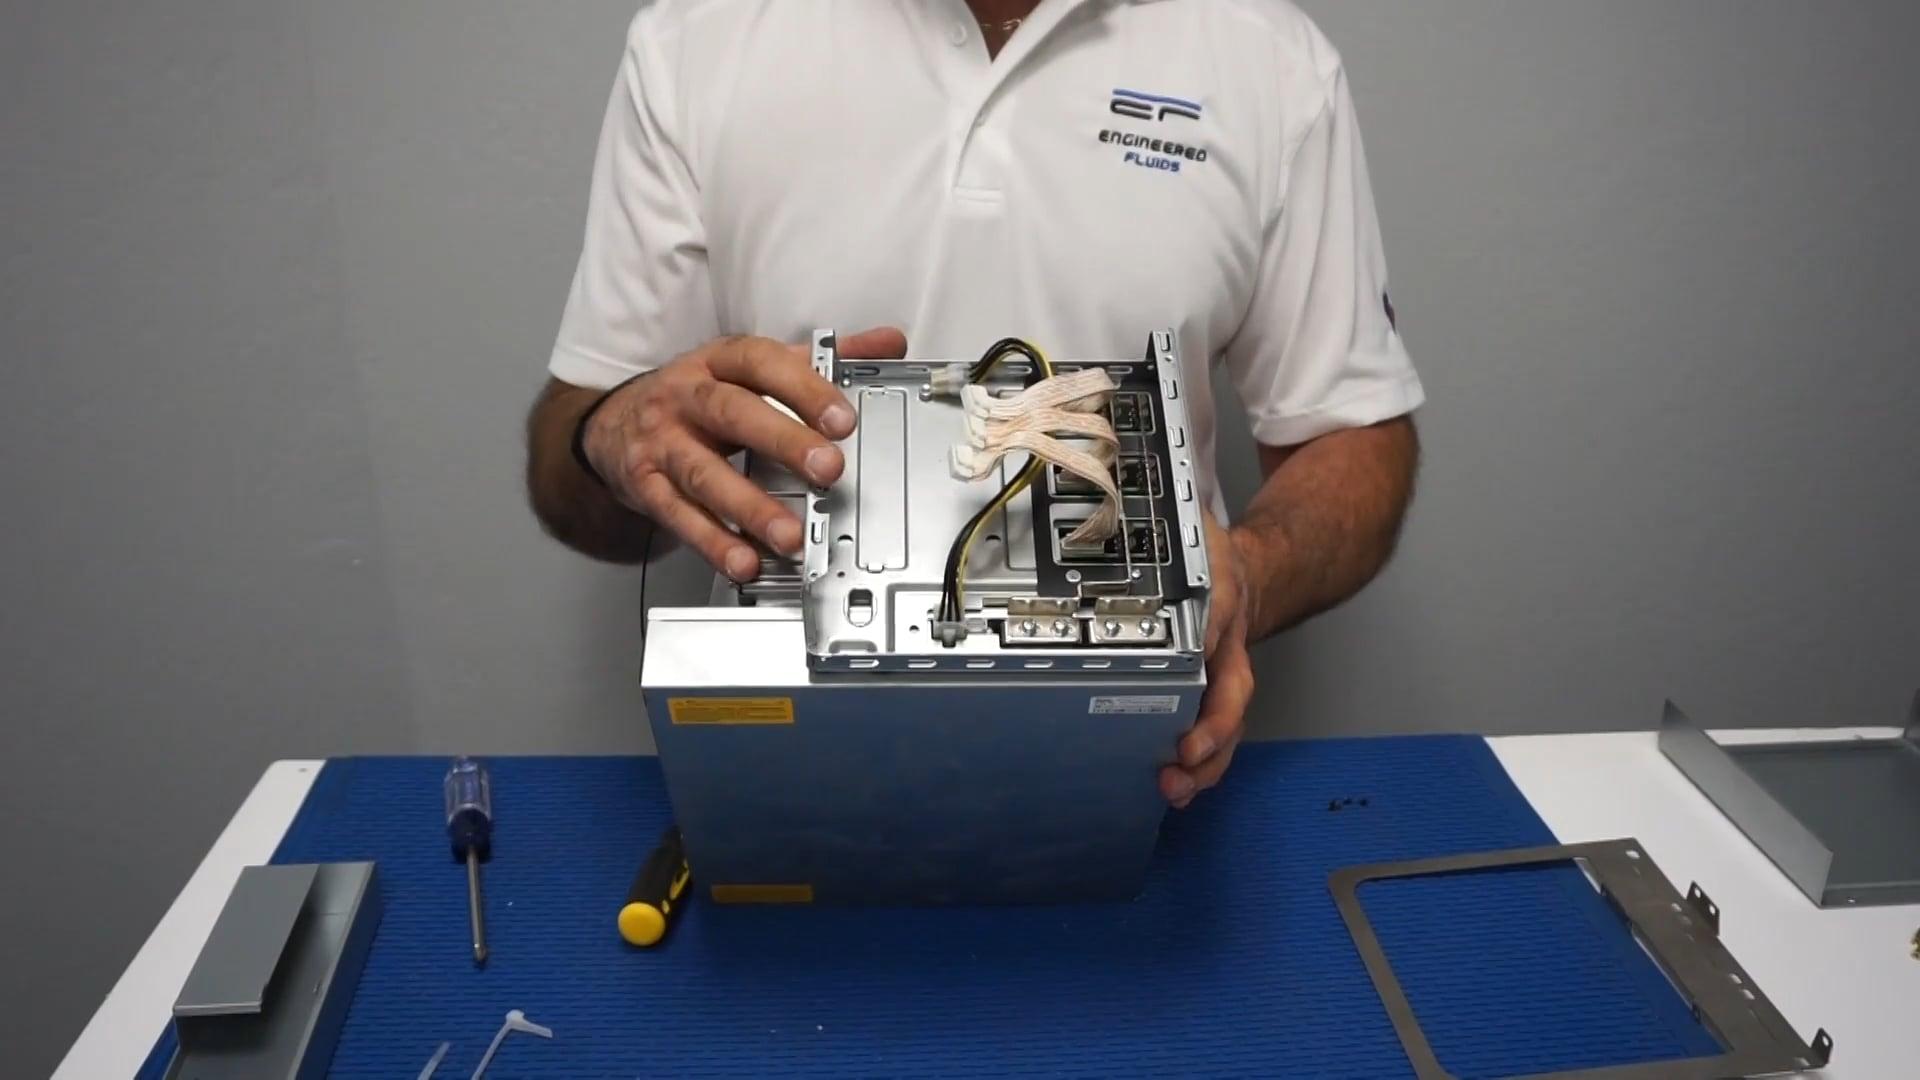 Engineered Fluids - S17 Immersion Kit - Installation Supplement